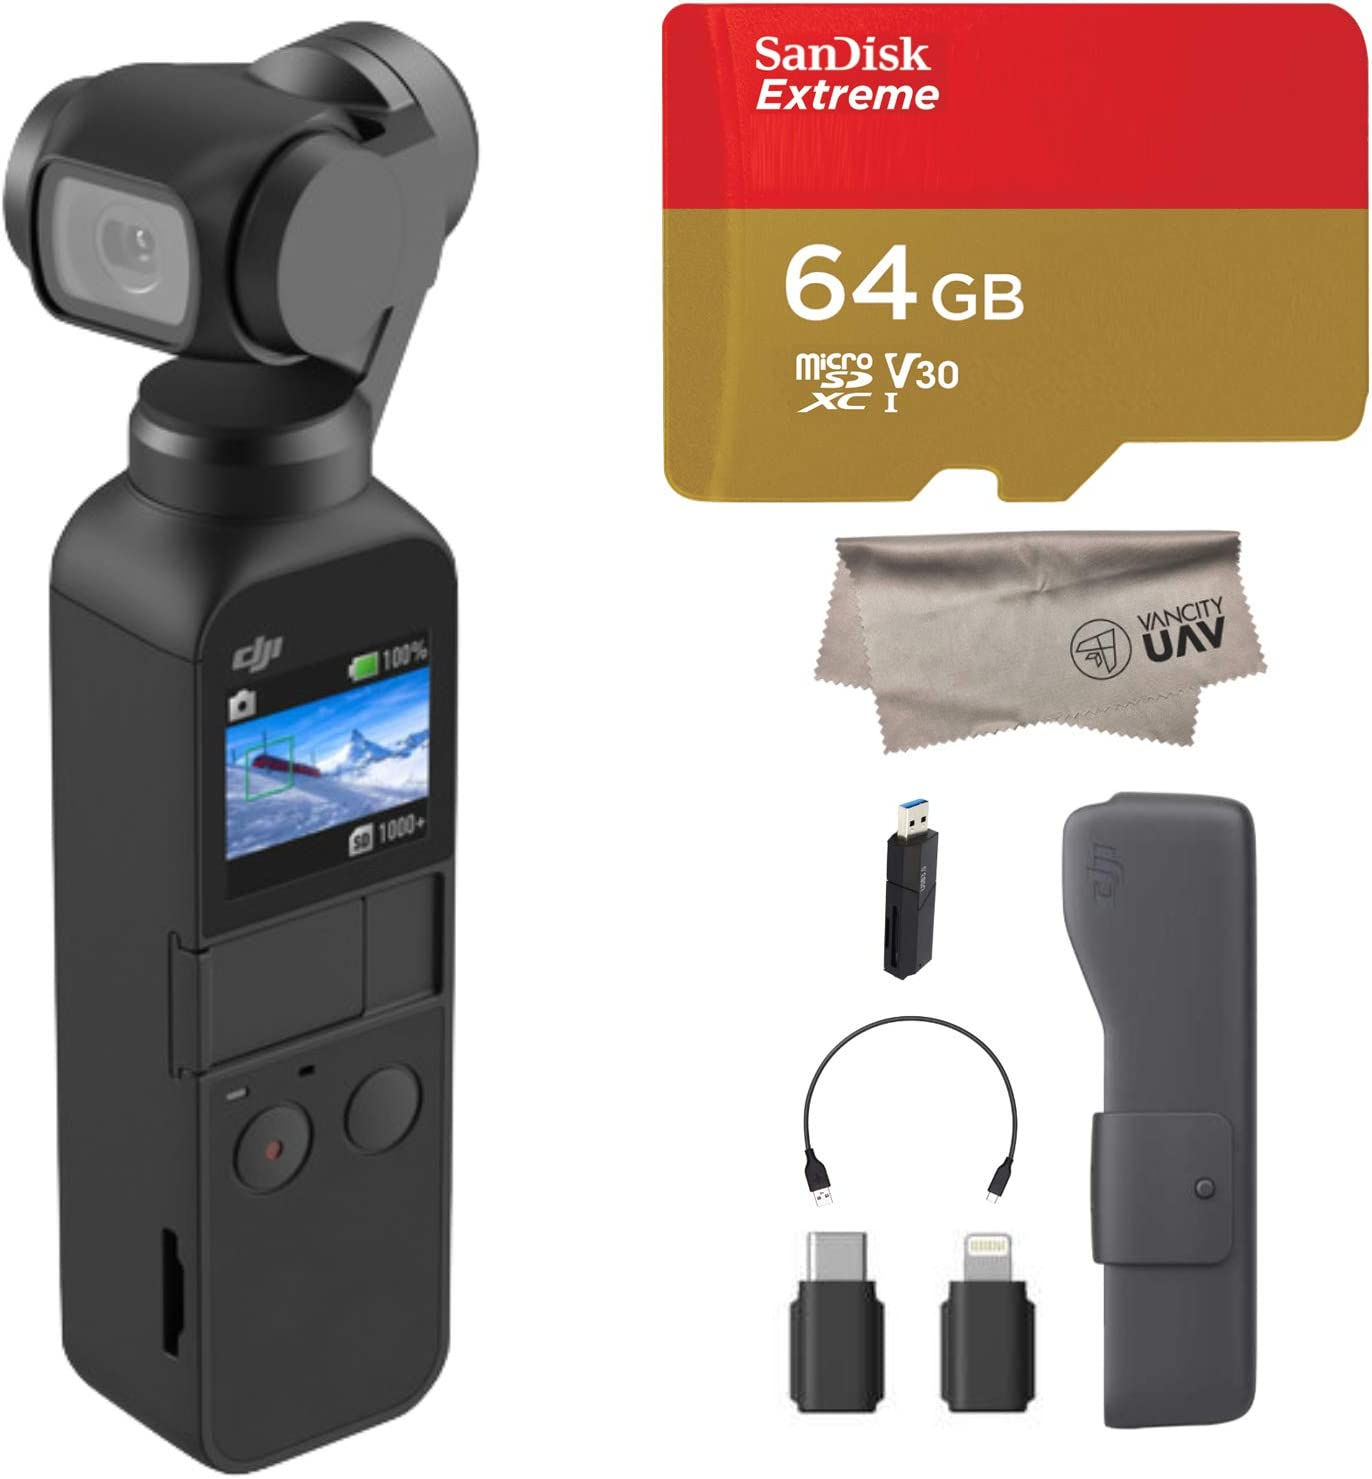 2019 DJI Osmo Pocket Handheld 3 Axis Gimbal with Integrated 4K Camera Bundle, Comes 128GB Extreme Micro SD